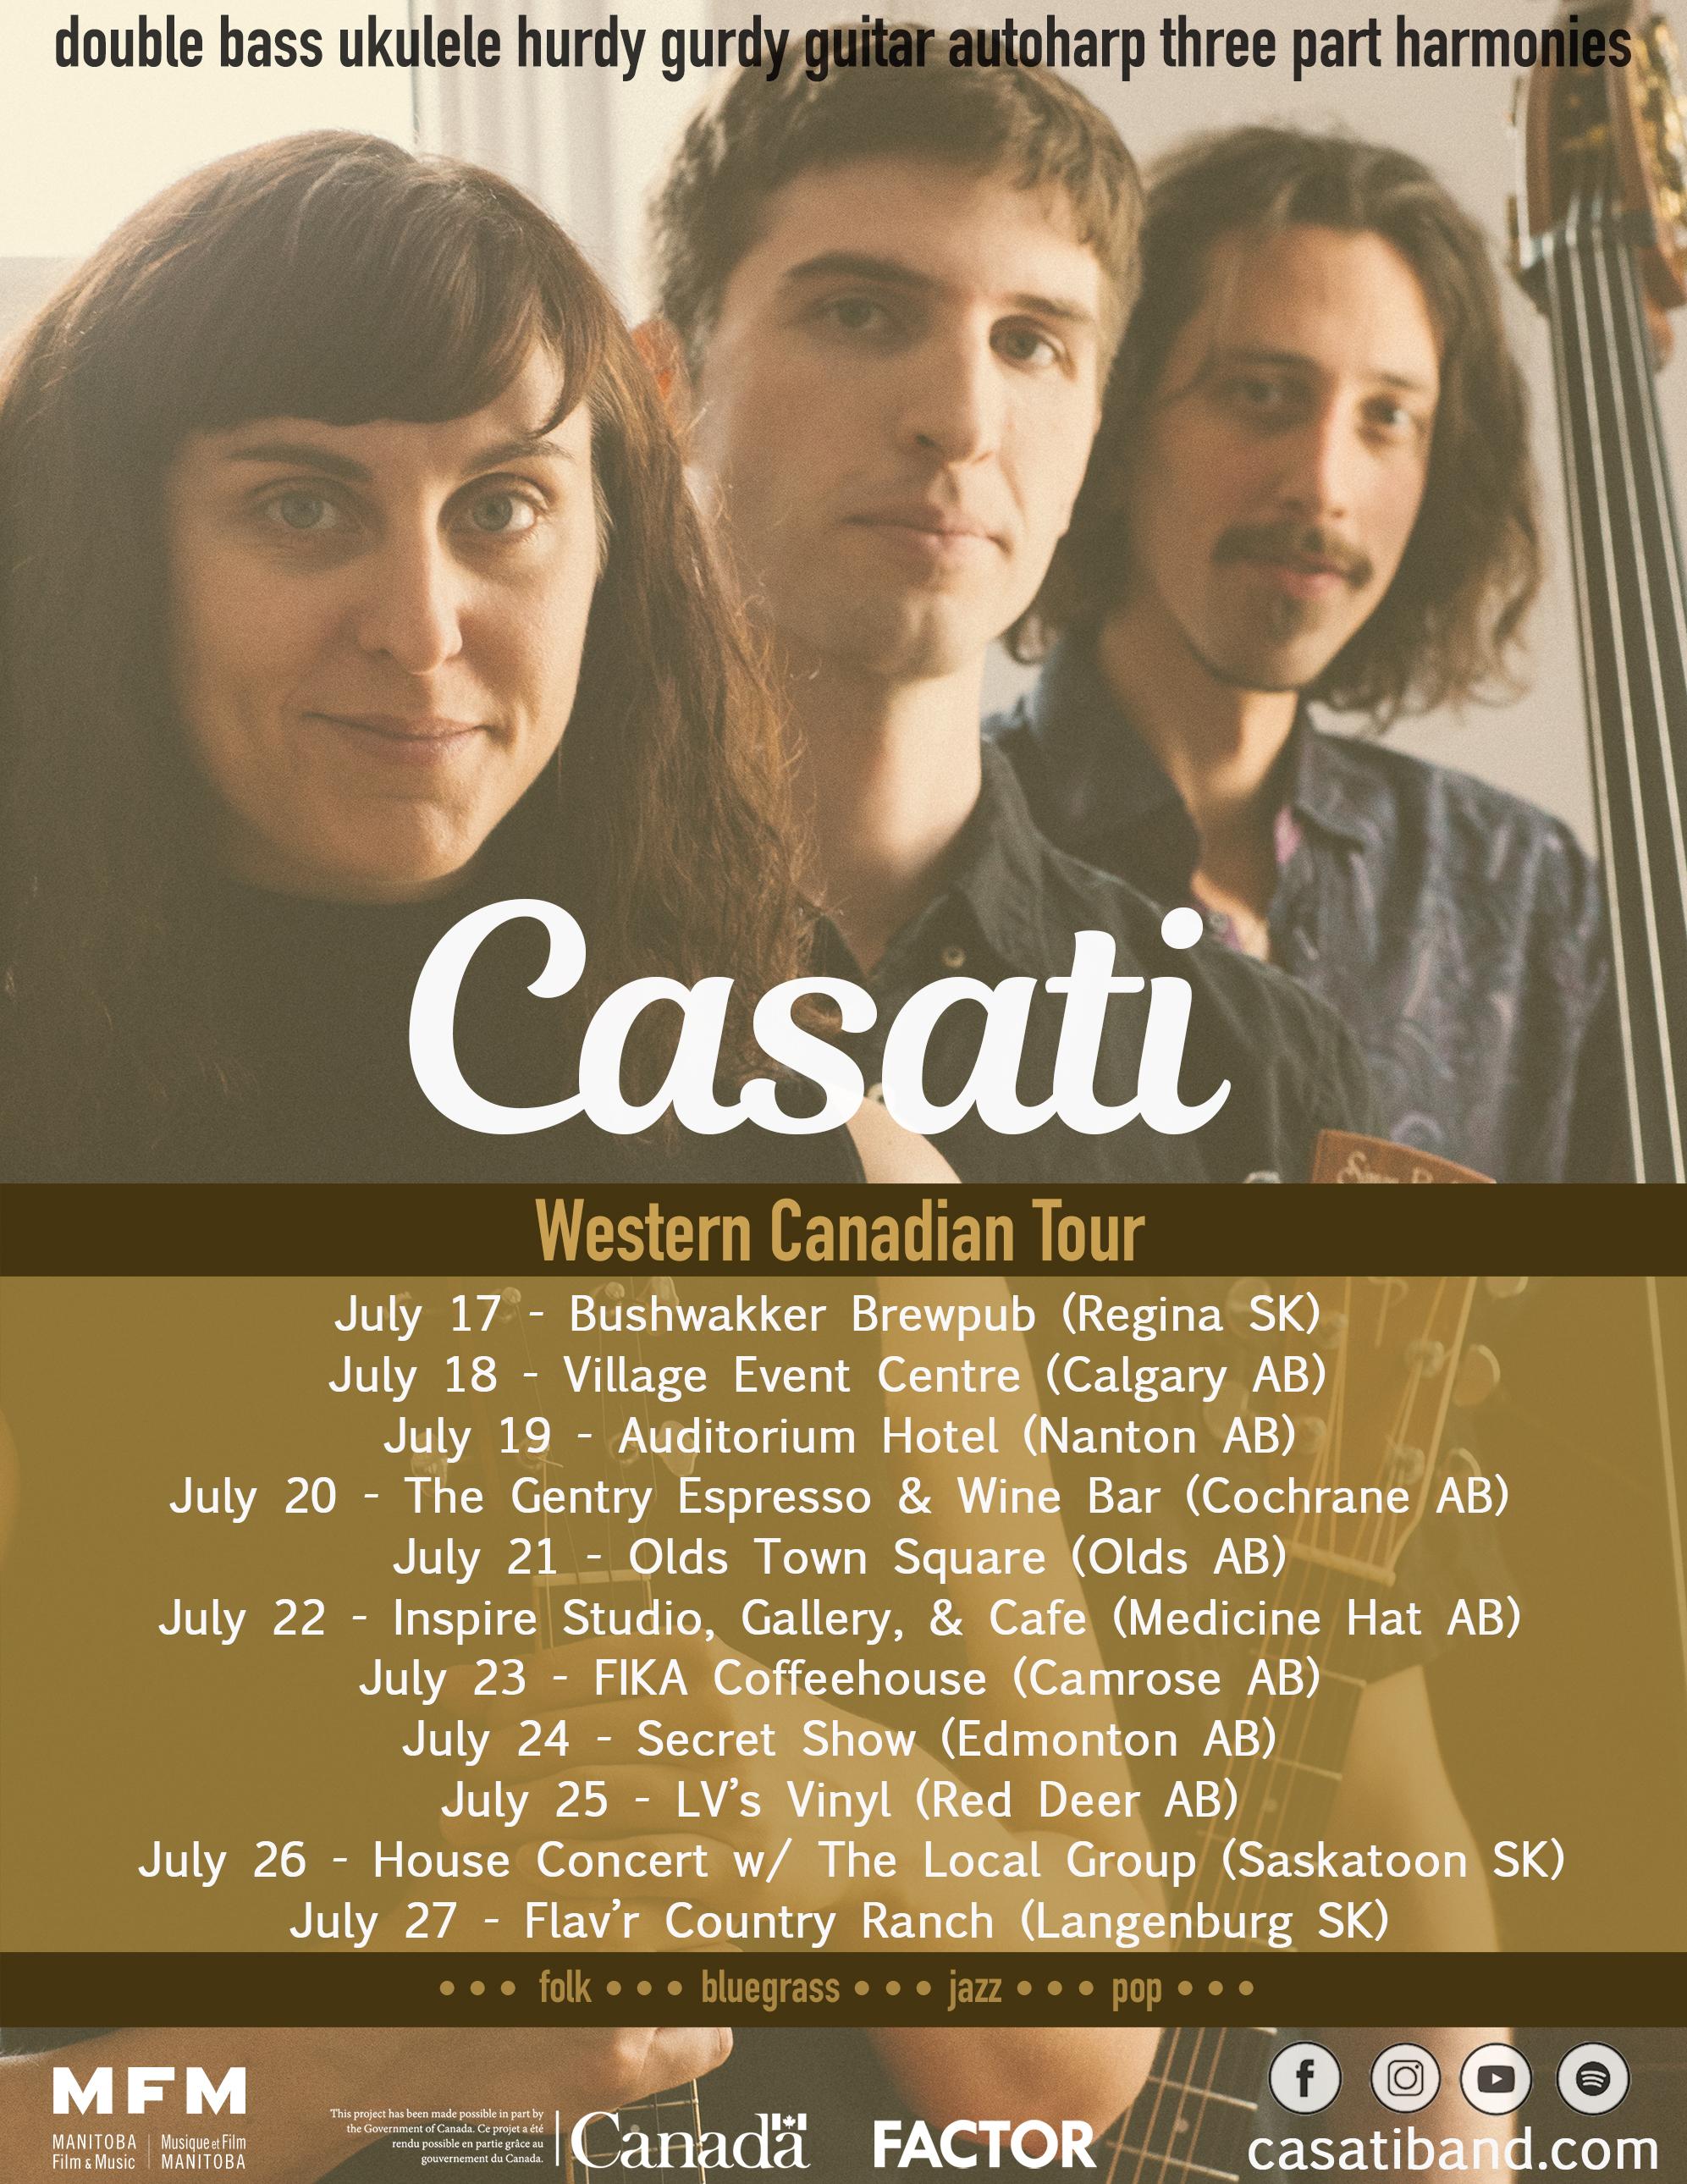 Full Tour Poster Casati July 2019 Western Canadian Tour.jpg